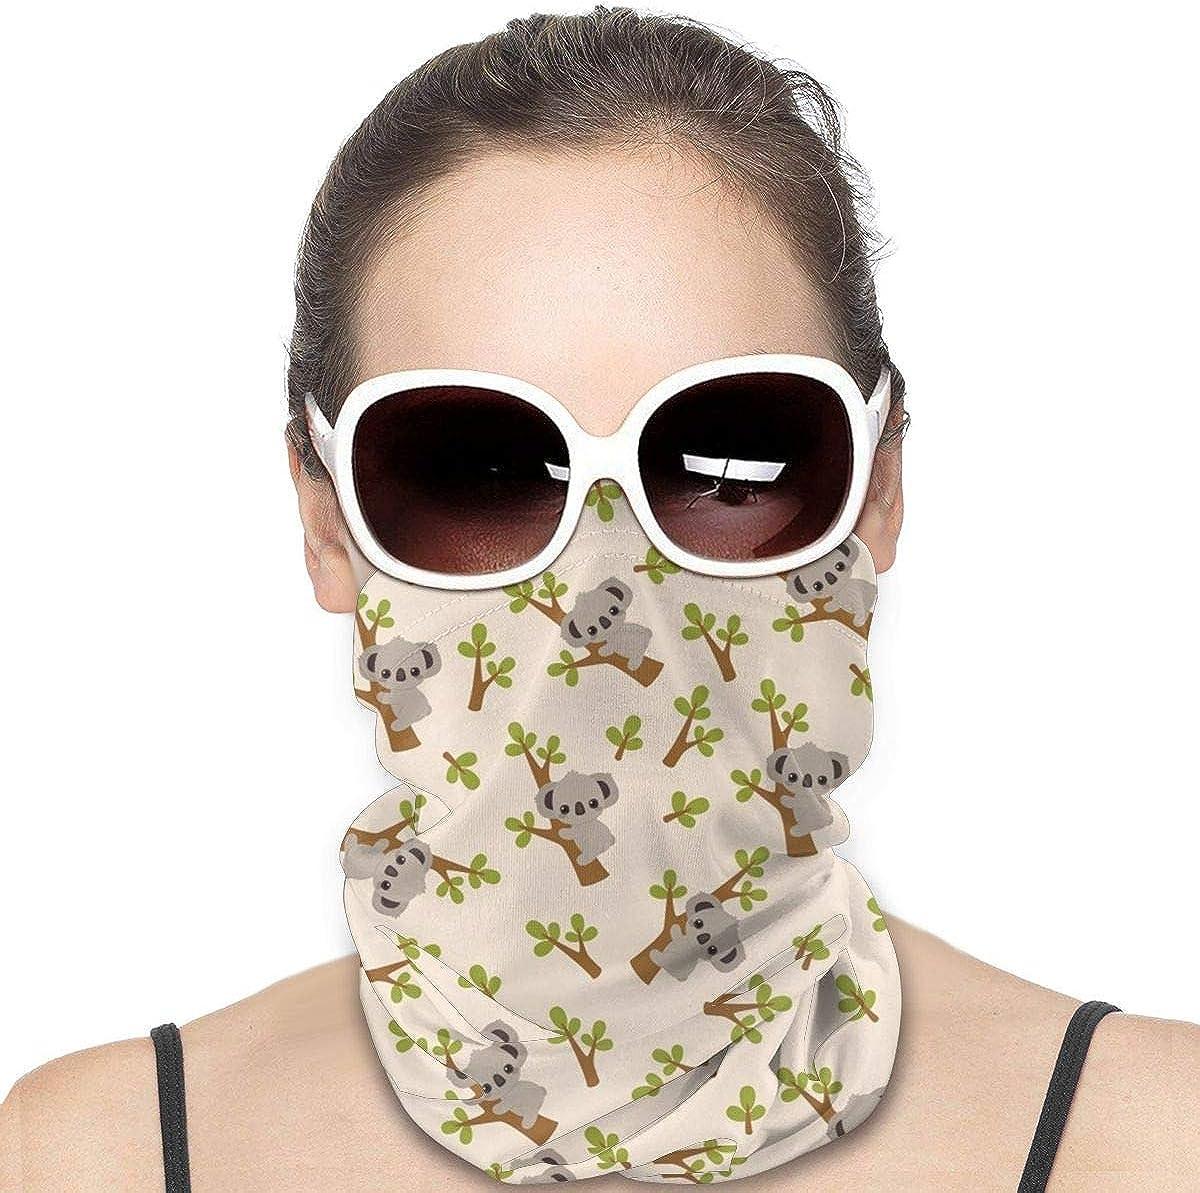 KiuLoam Women Bandanas Face Mask, Koala on Tree Neck Gaiter Mask Headband for Men Face Scarf Dust, Outdoors, Sports